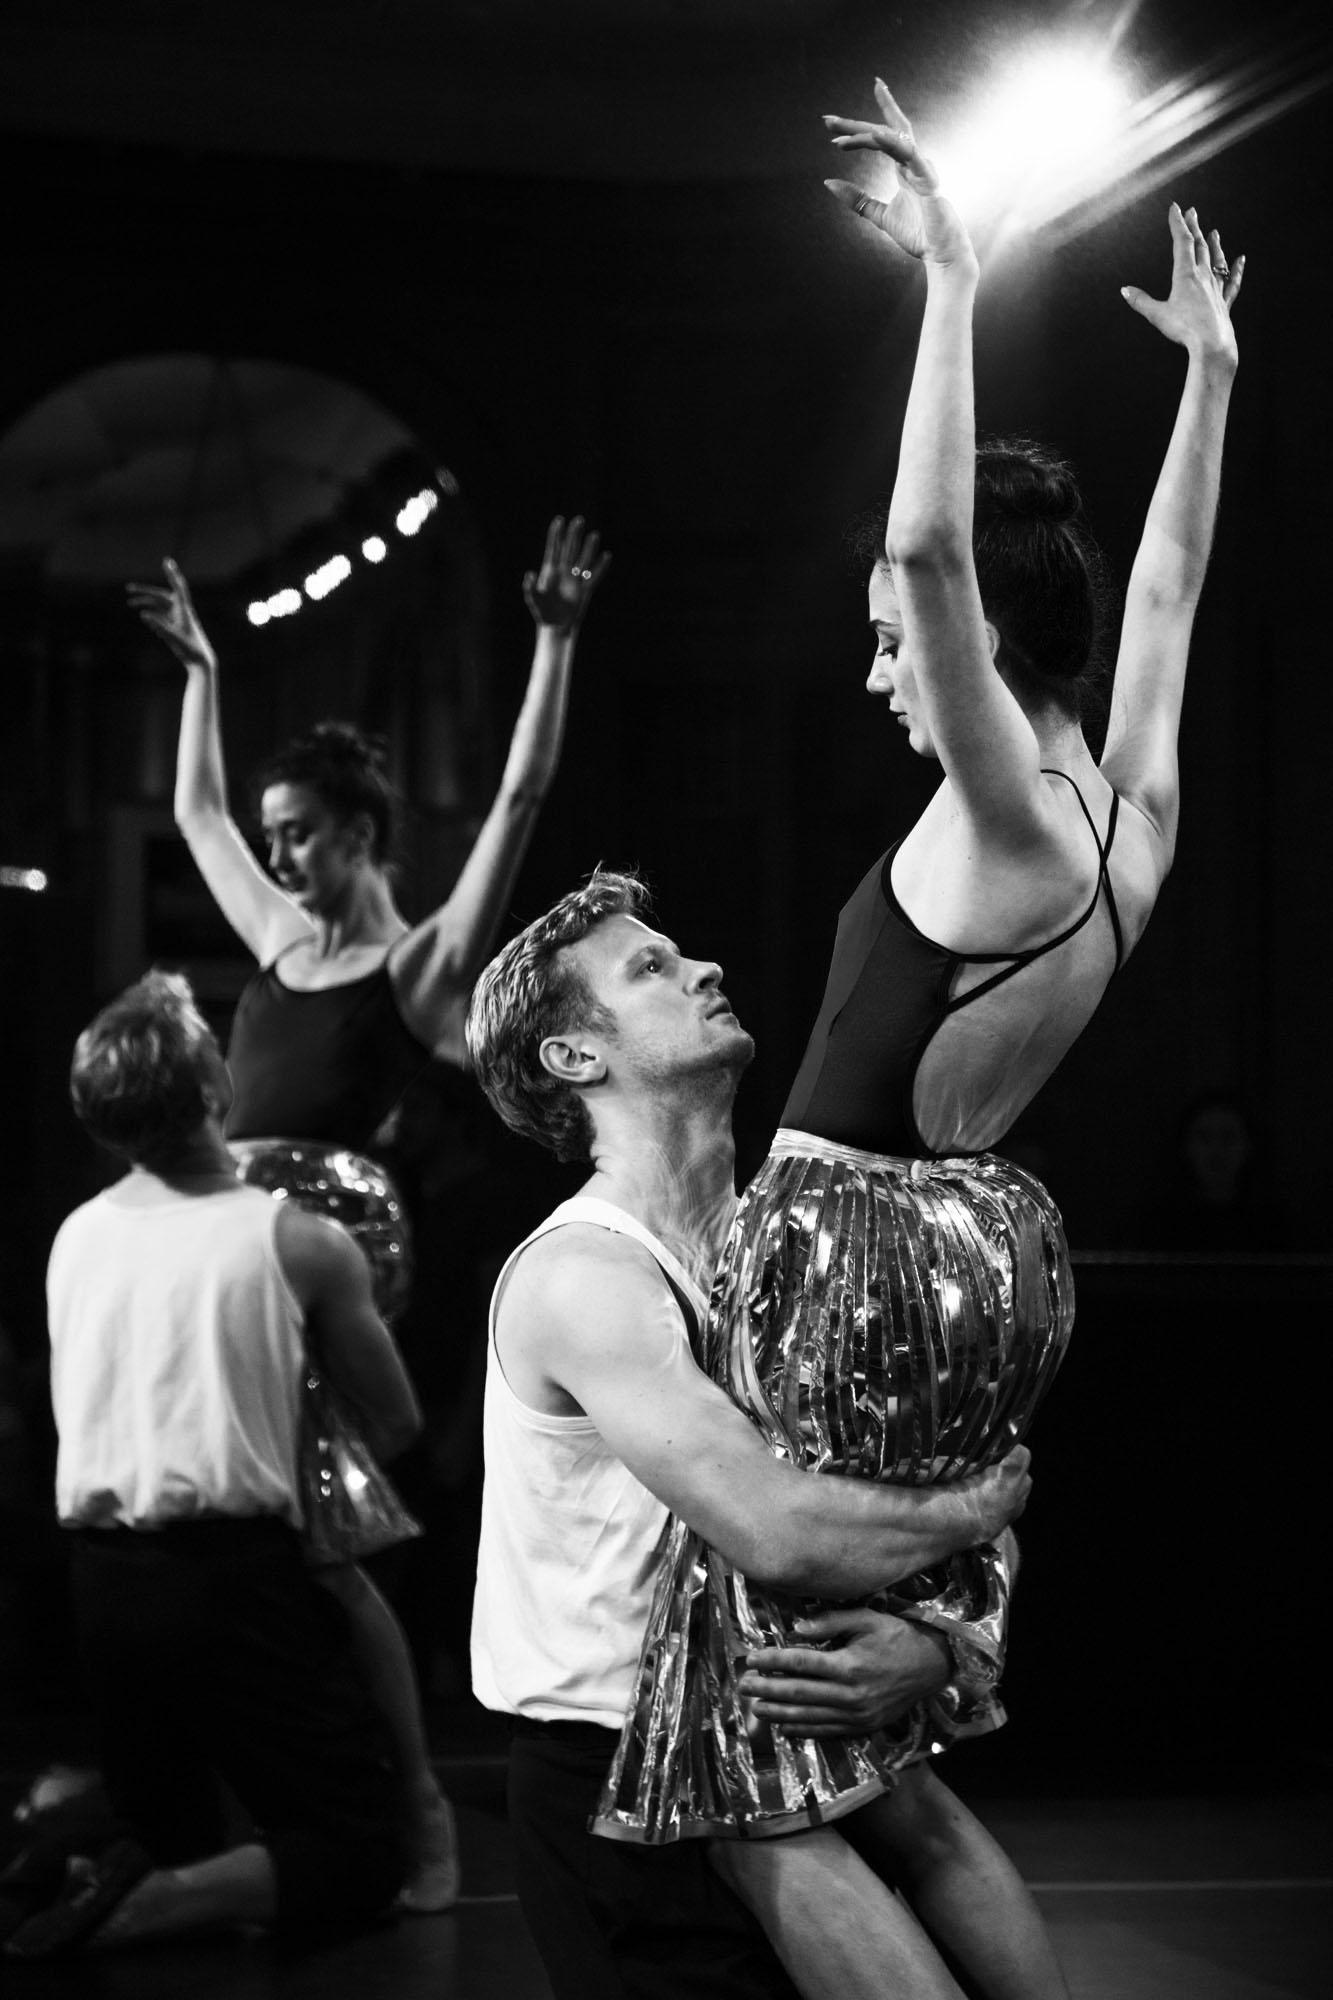 nyc_ballet_x_cartier_010